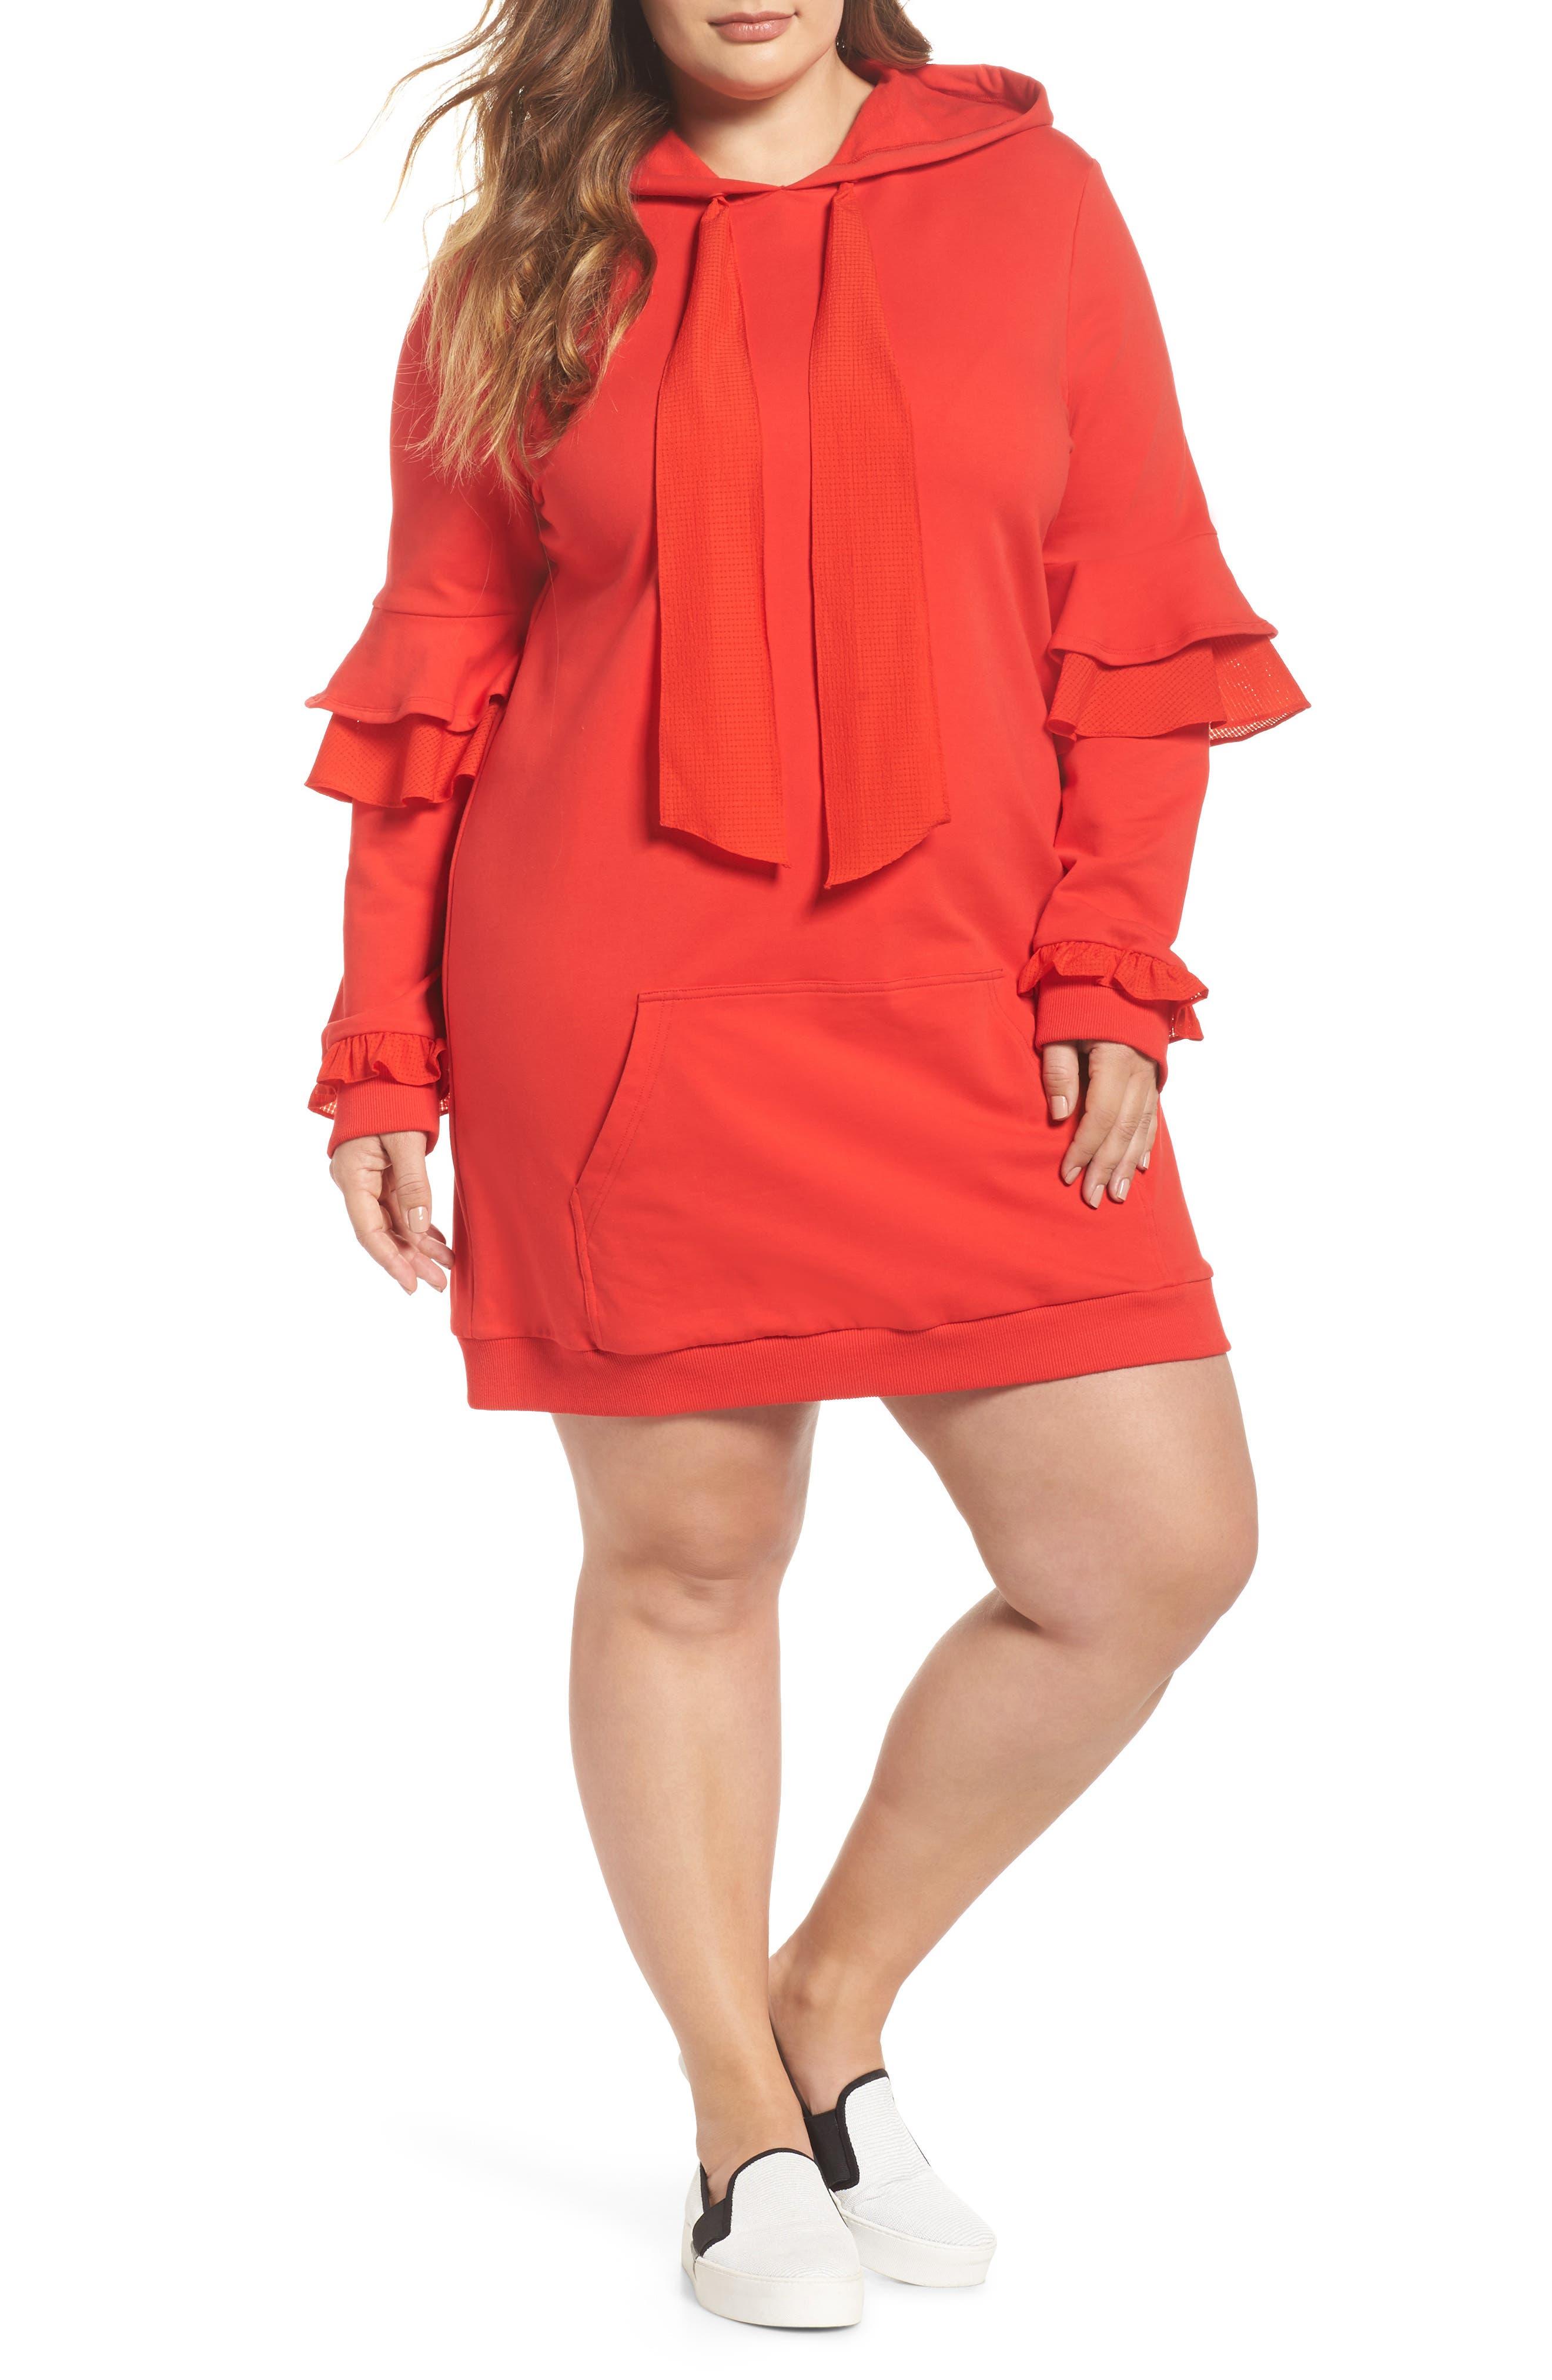 Main Image - ELVI The Snapdragon Ruffle Sleeve Hoodie Dress (Regular & Plus Size)